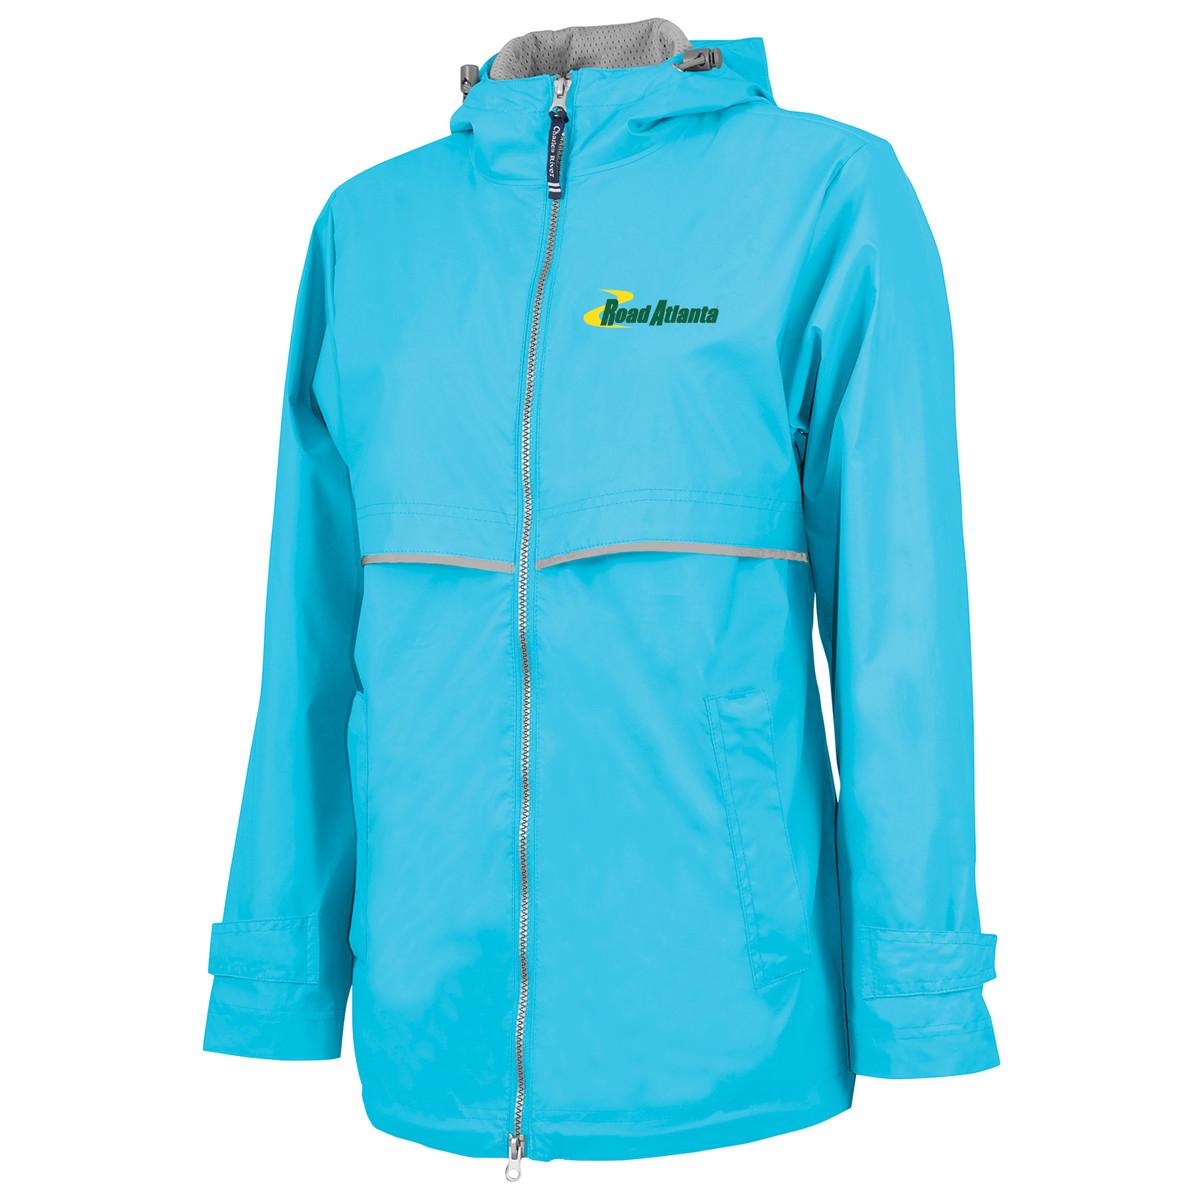 Road Atlanta Ladies NE Rain Jacket- Wave Blue